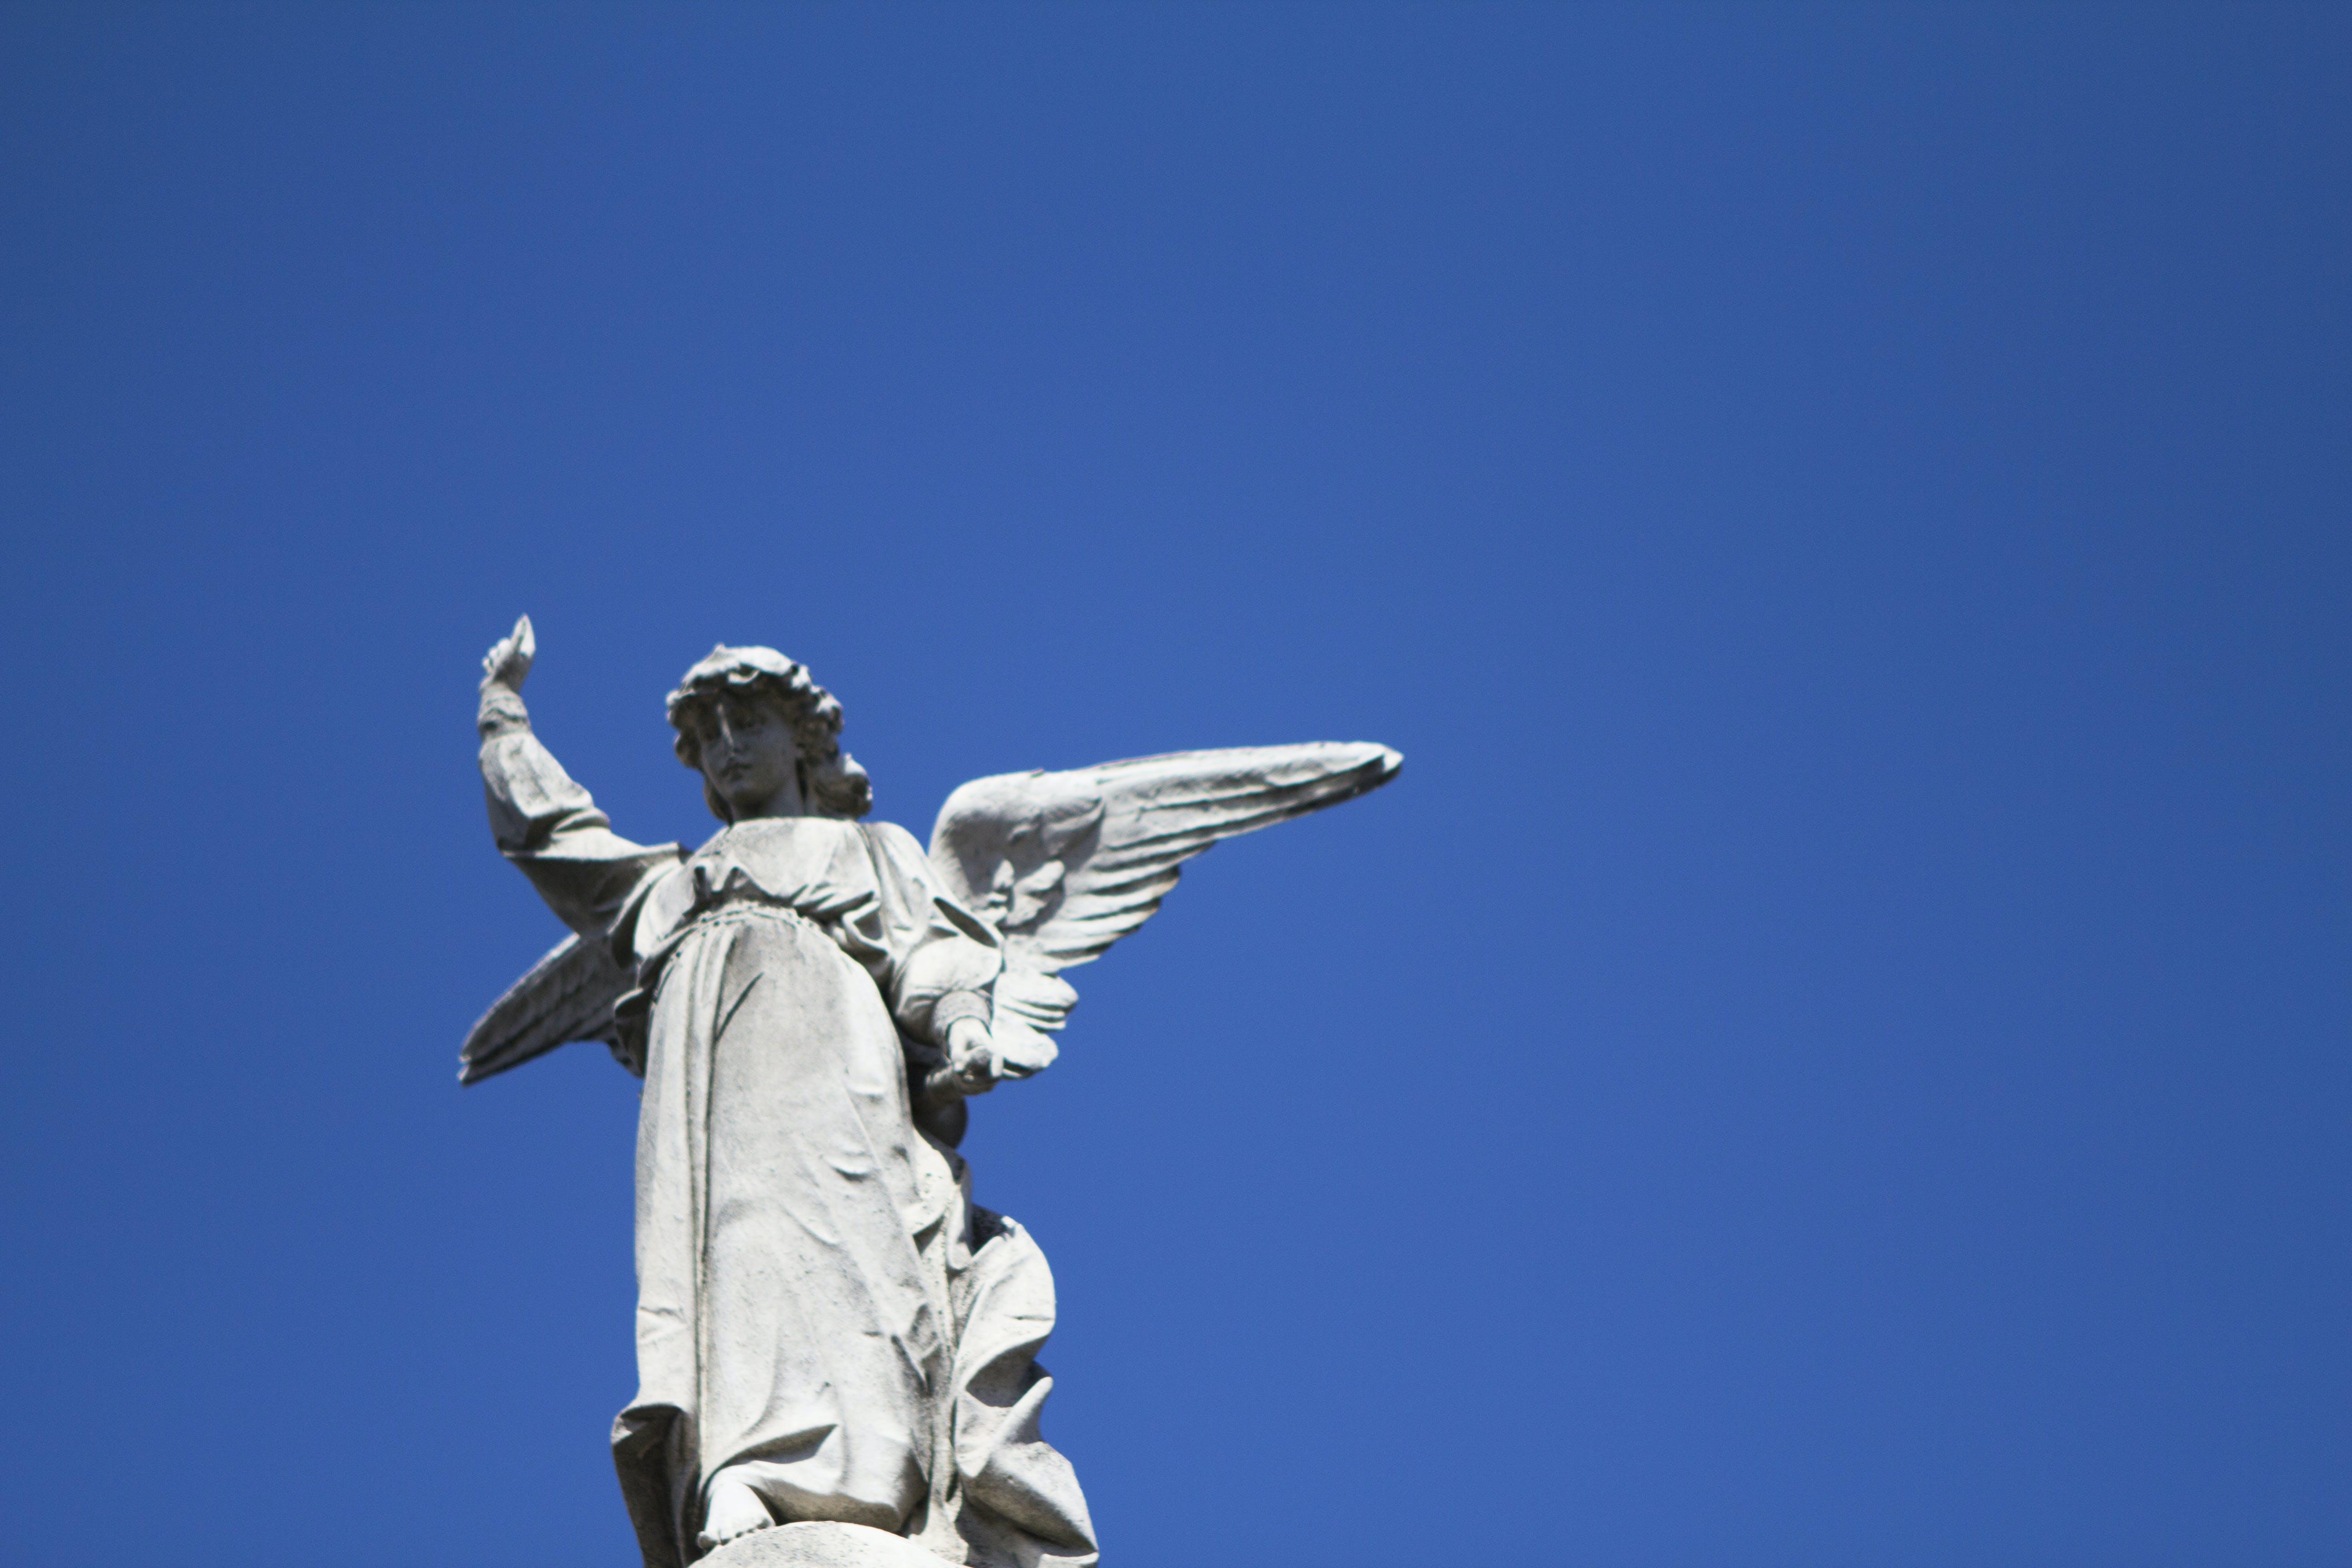 Kostenloses Stock Foto zu buenos aires, engel, friedhof, himmel